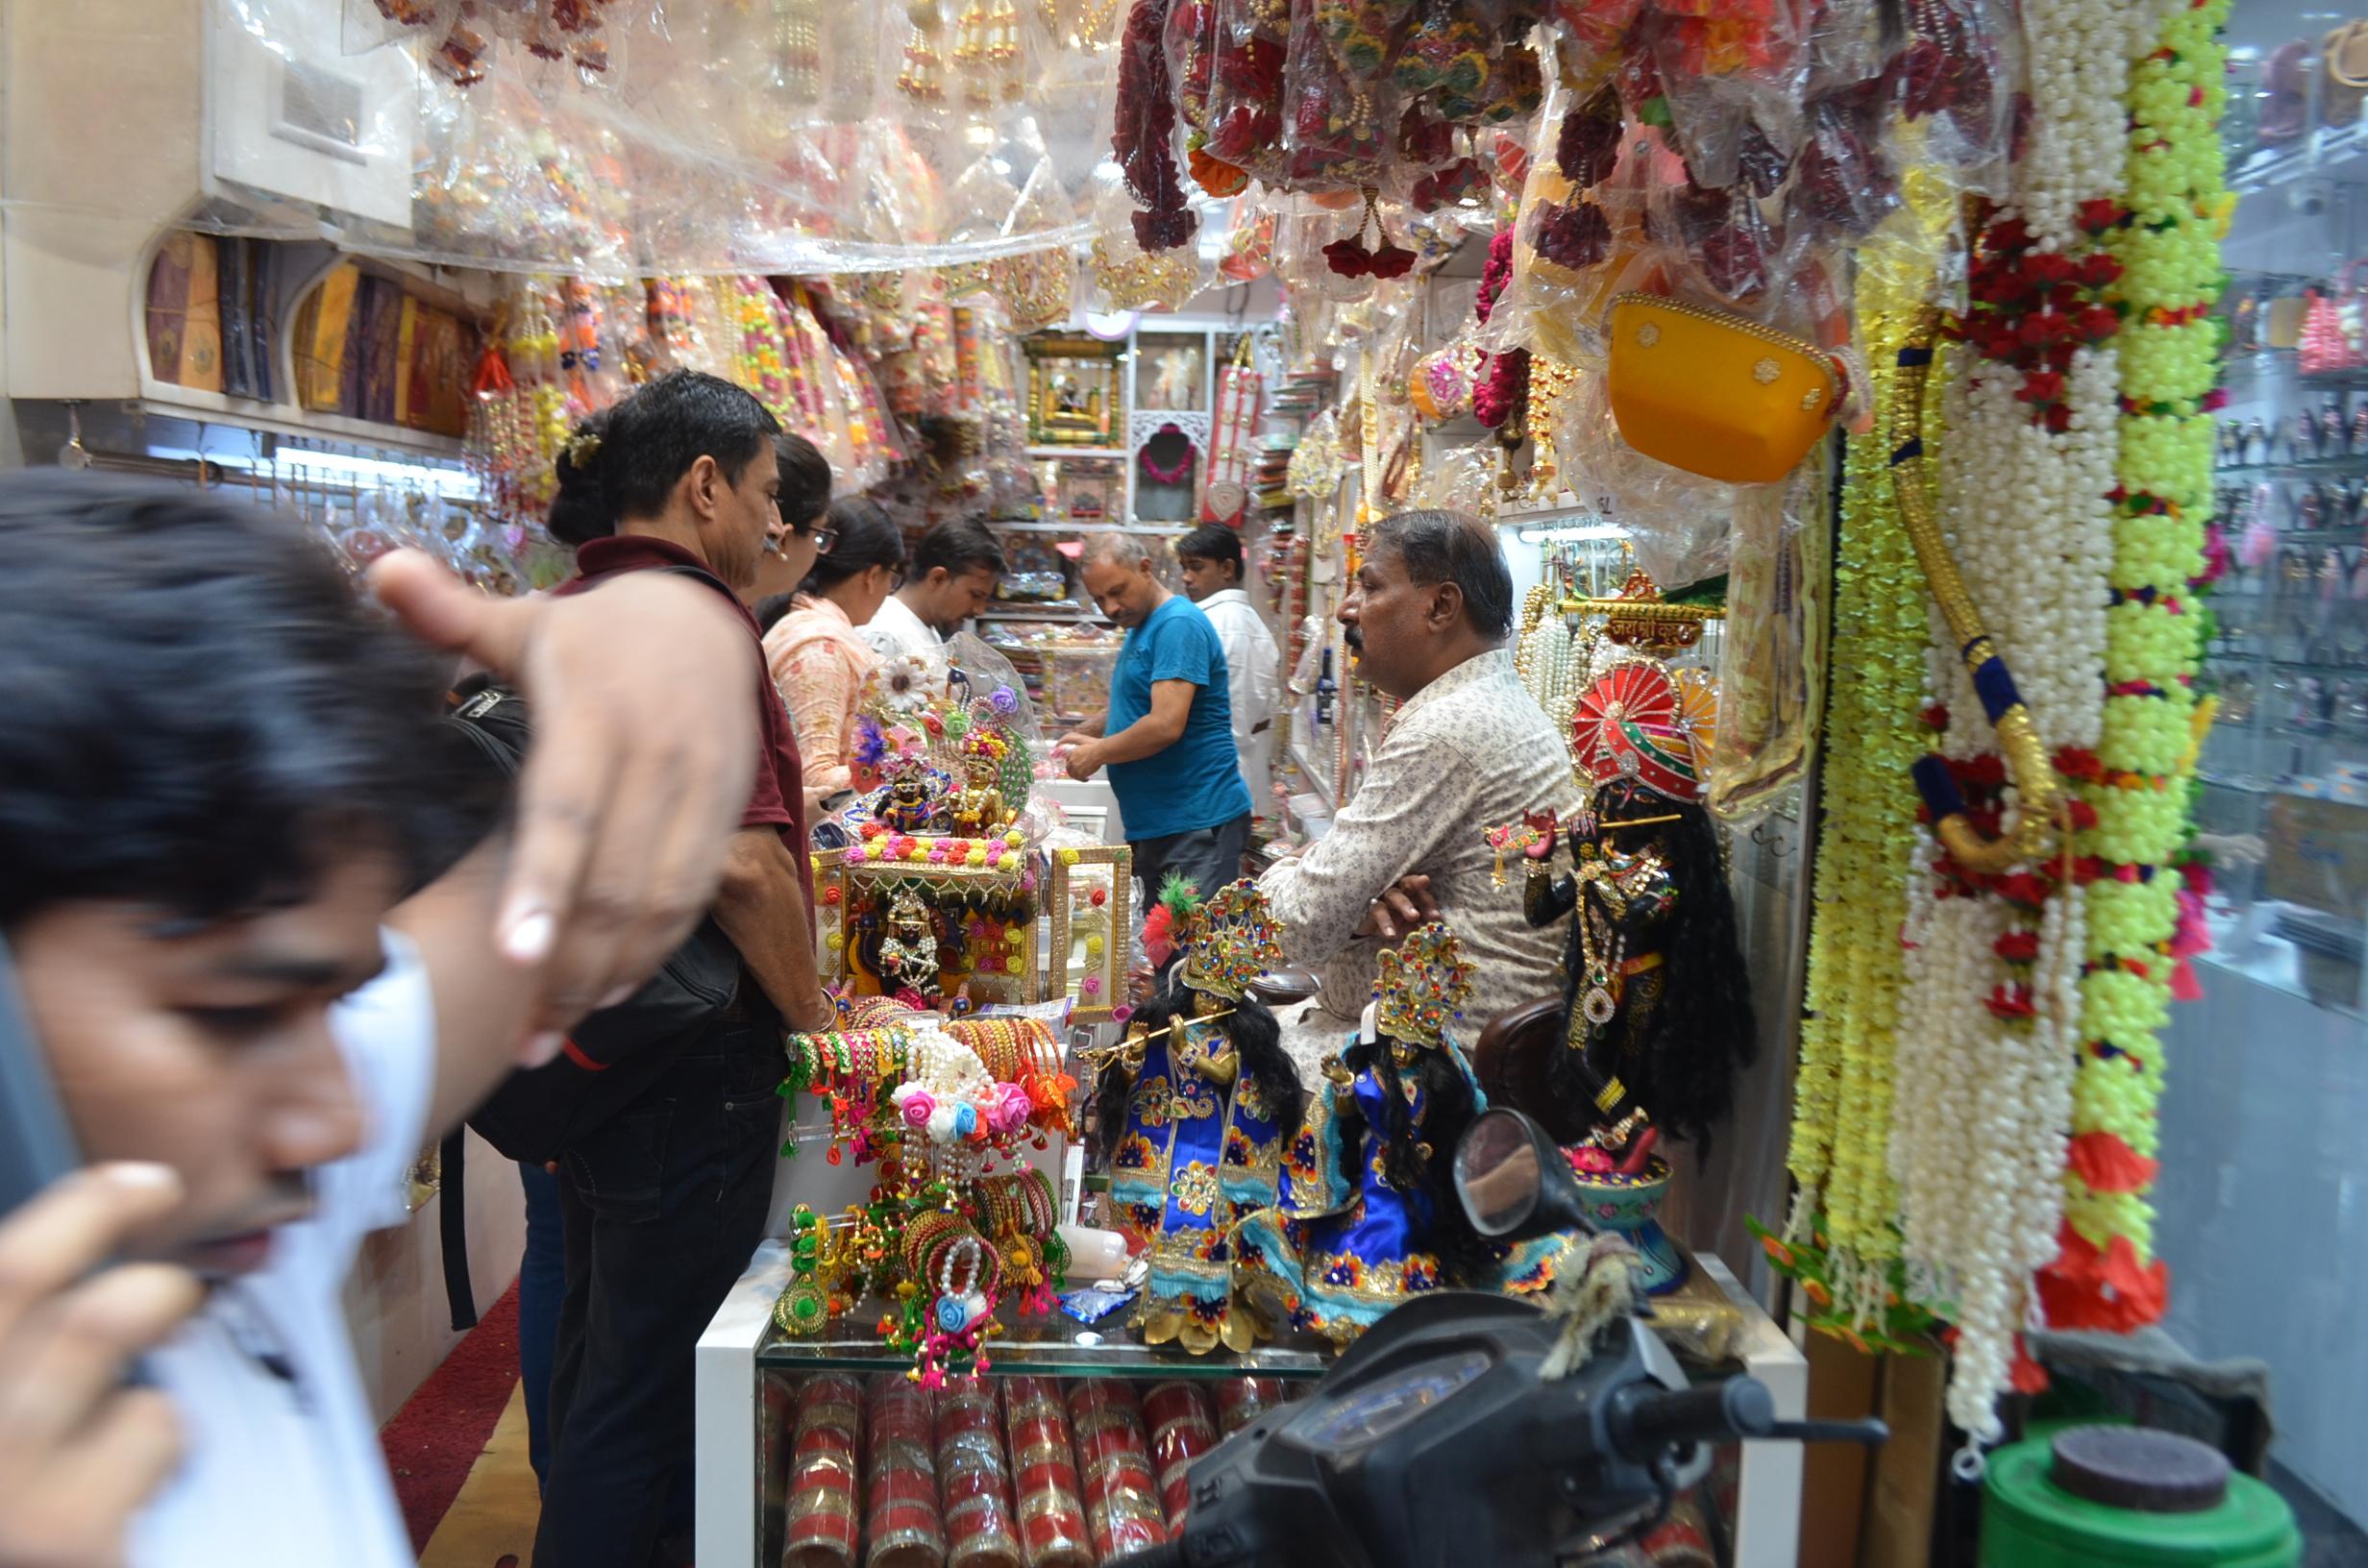 Chandni Chowk Amazing Market to Shop in Delhi